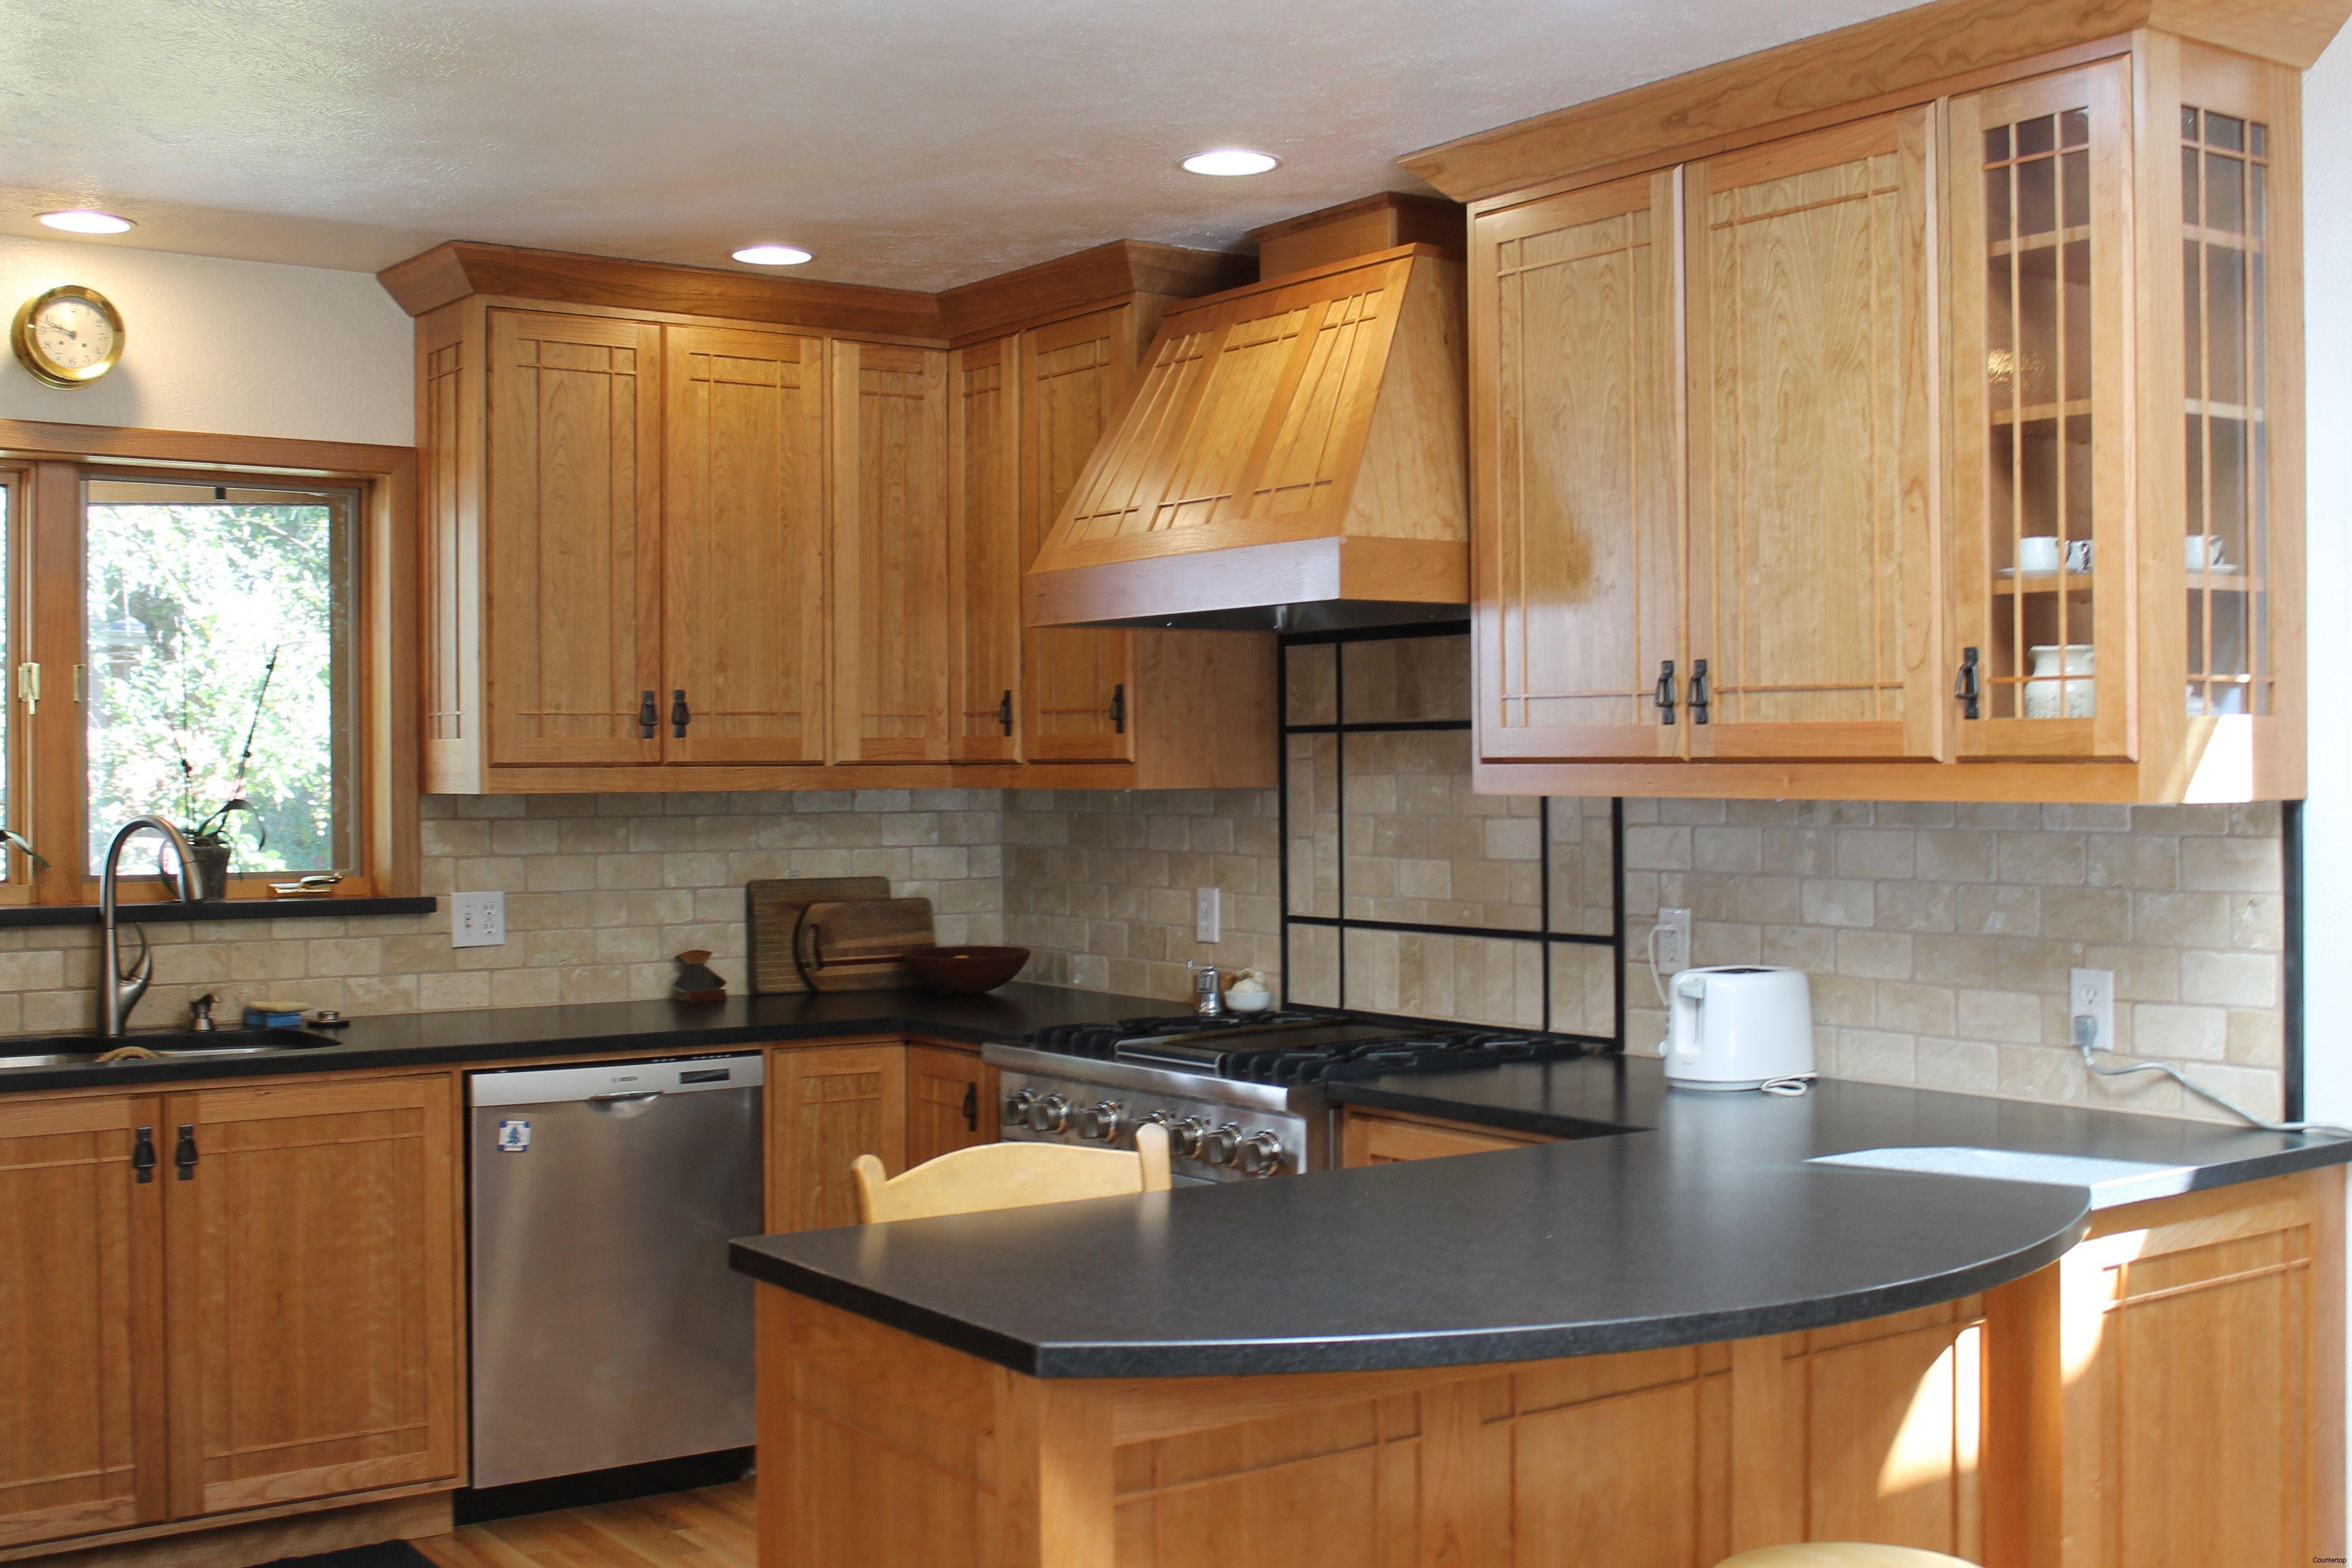 Image result for backsplash for kitchen with honey oak ... on Kitchen Backsplash Ideas With Maple Cabinets  id=19997